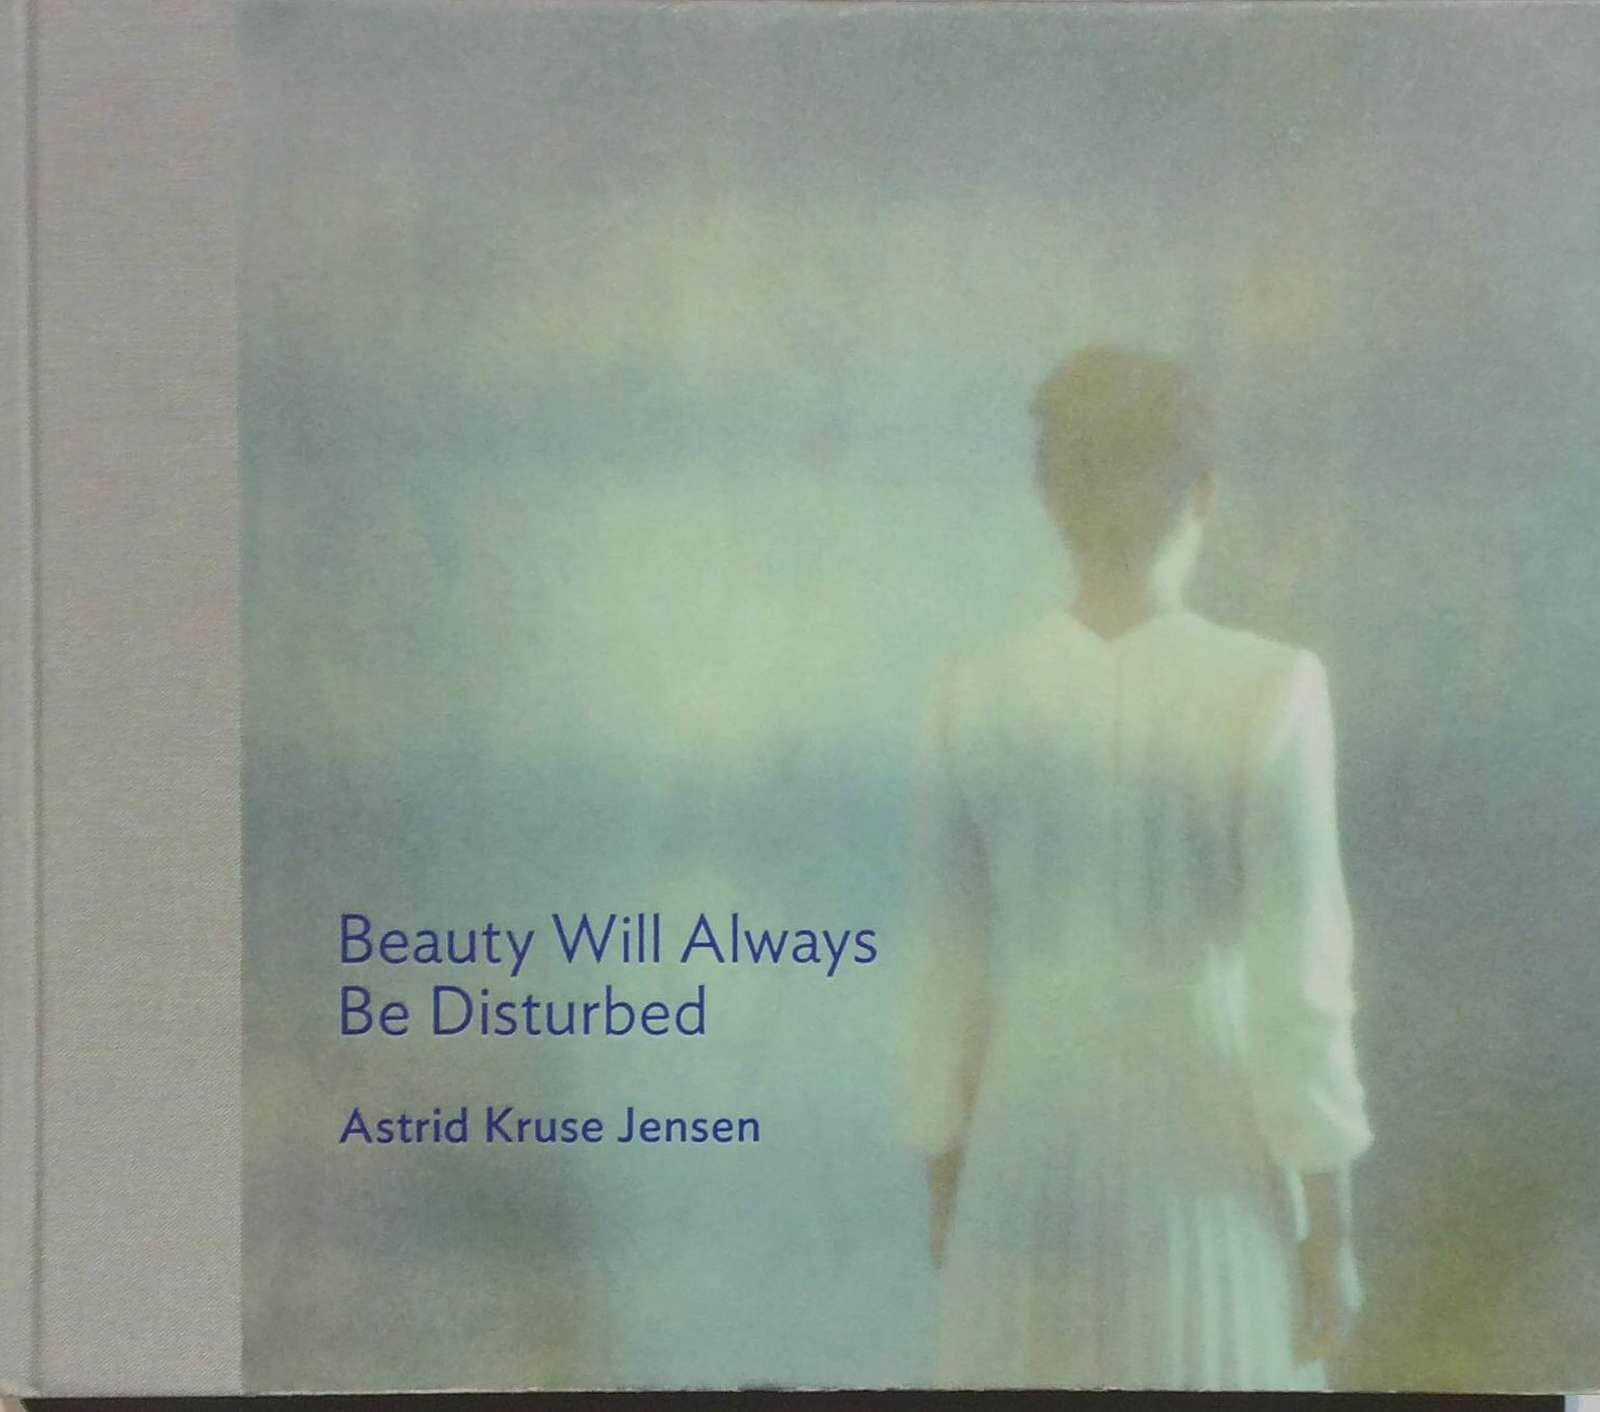 Jensen, Astrid Kruse. Beauty Will Always Be Disturbed